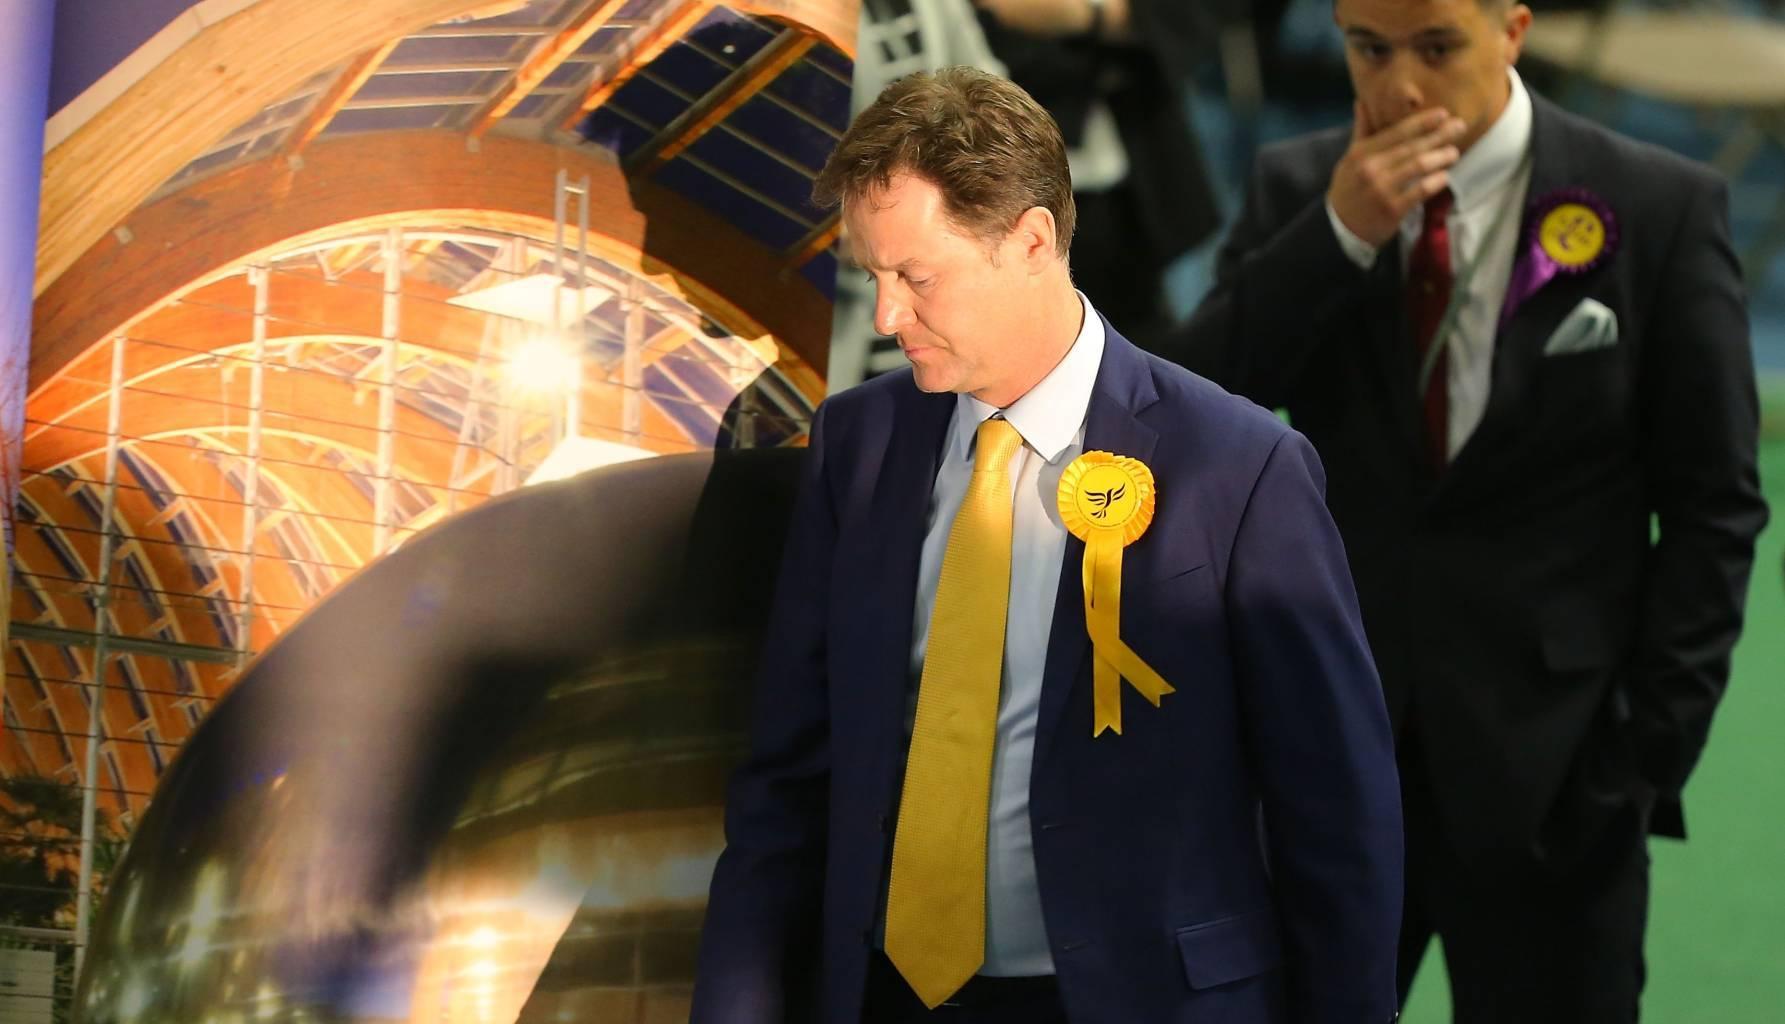 Liberal Democrat leader  Nick Clegg resigned today